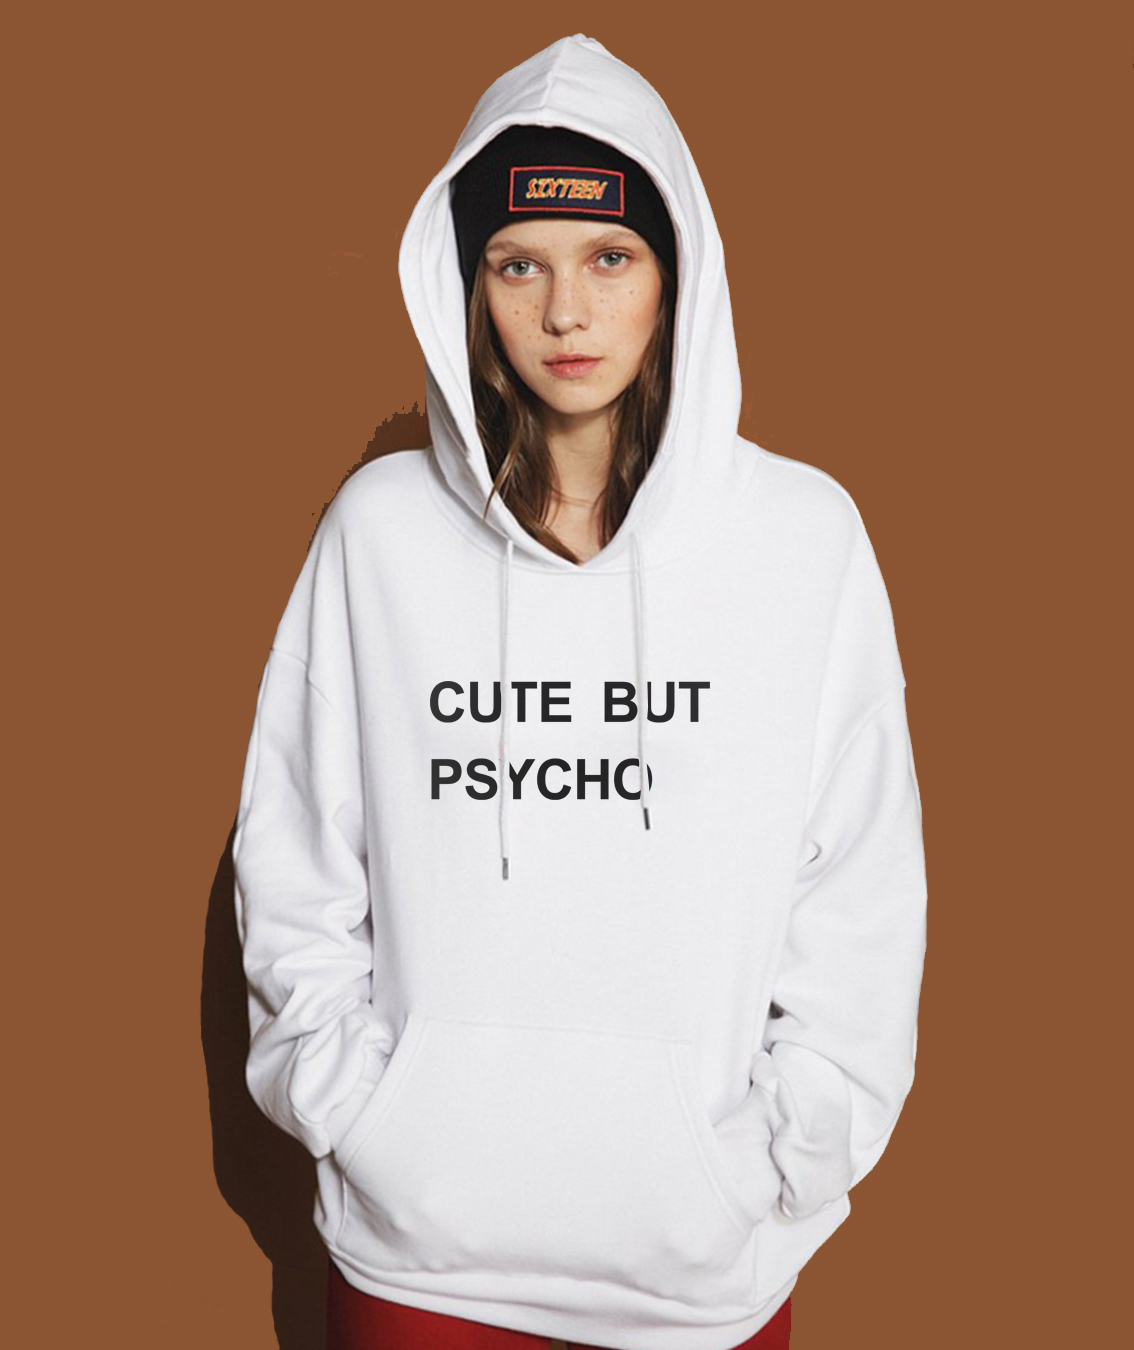 2019 Spring Fleece Winter Women's Sweatshirt Print fashion Casual Hoody For Women Kpop Clothes Hip Hop Pullover Female Hoodies